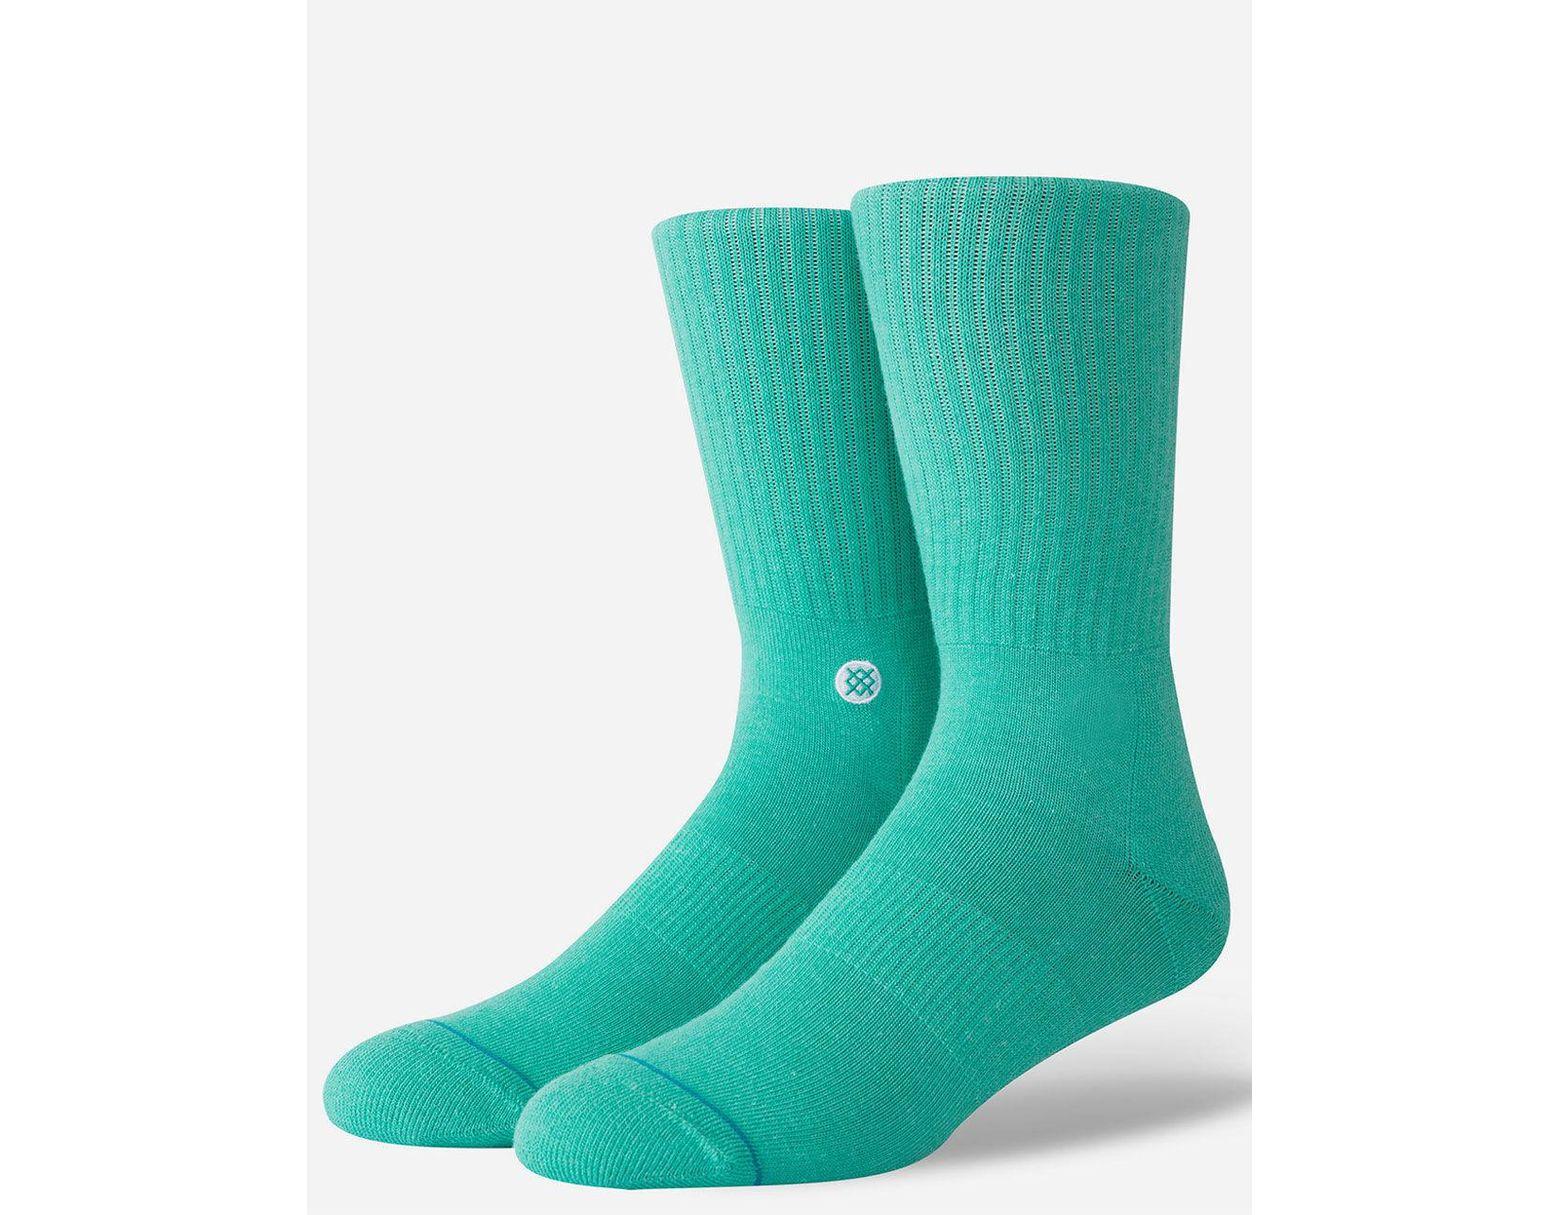 Sea Green Medium Stance Icon Men/'s Socks 6-8.5